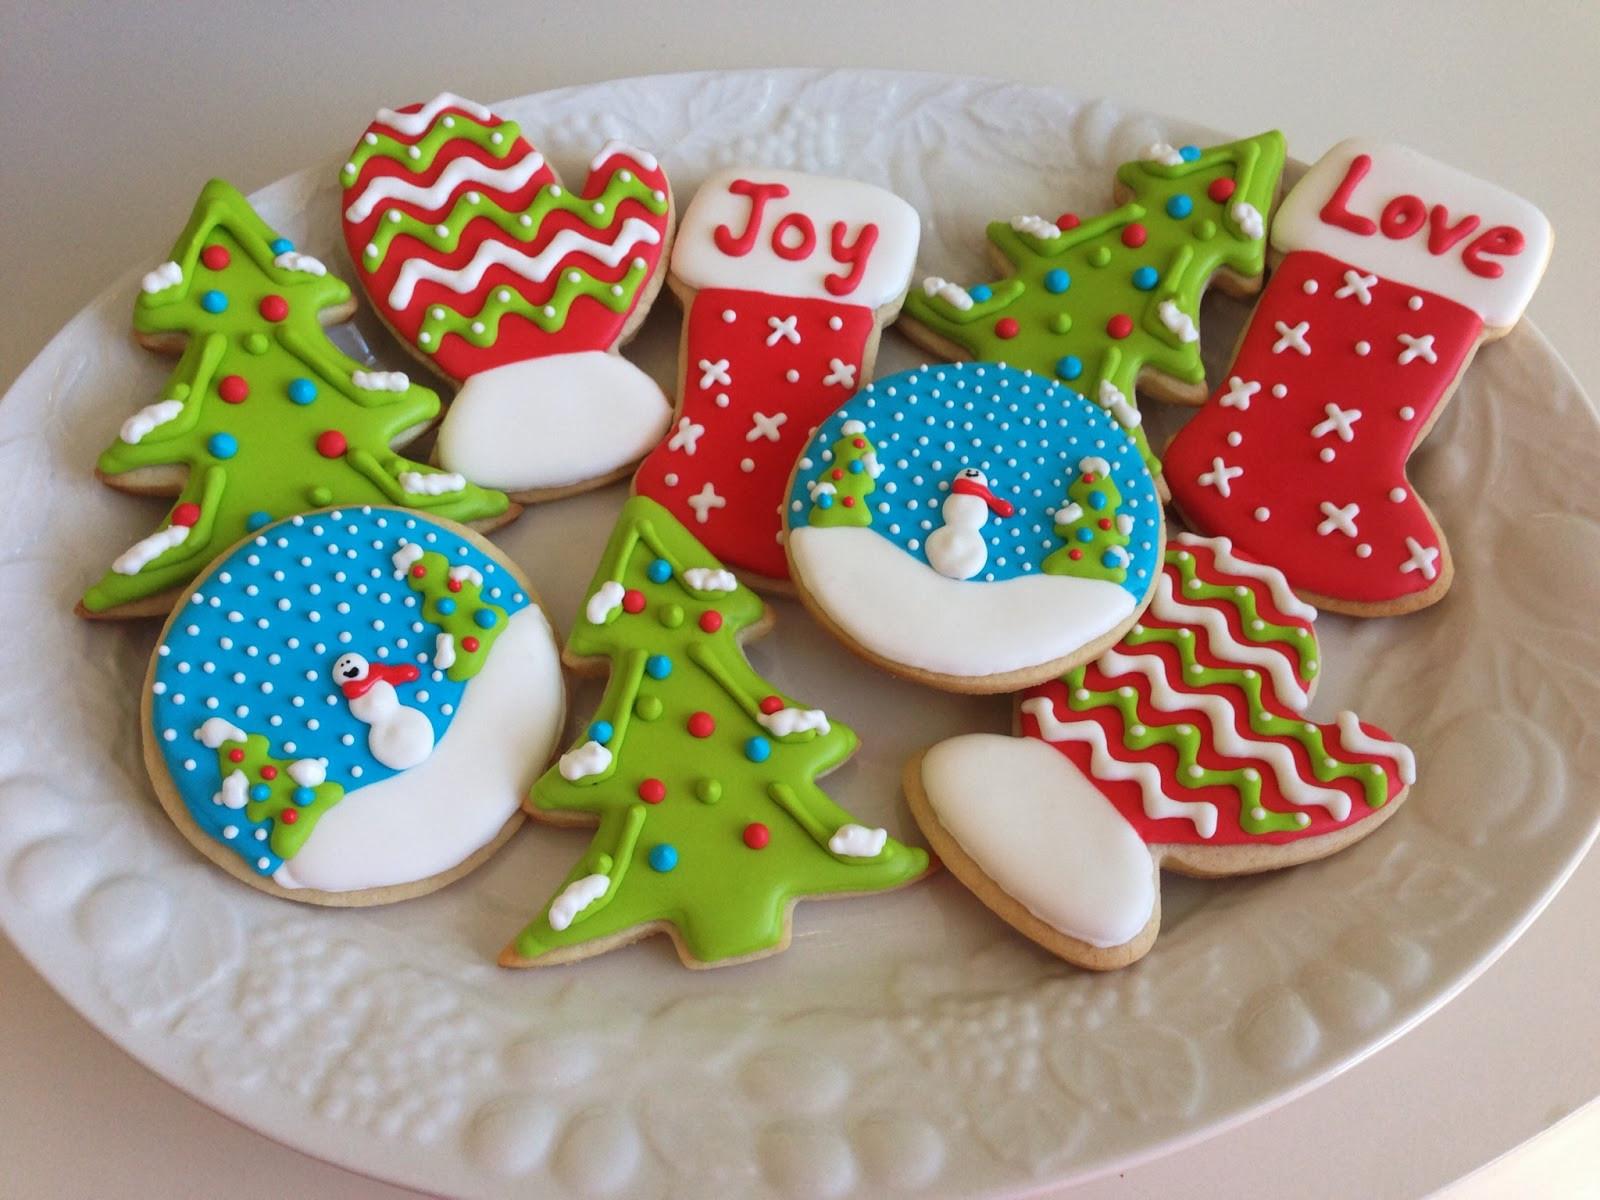 Christmas Sugar Cookies With Icing  monograms & cake Christmas Cut Out Sugar Cookies with